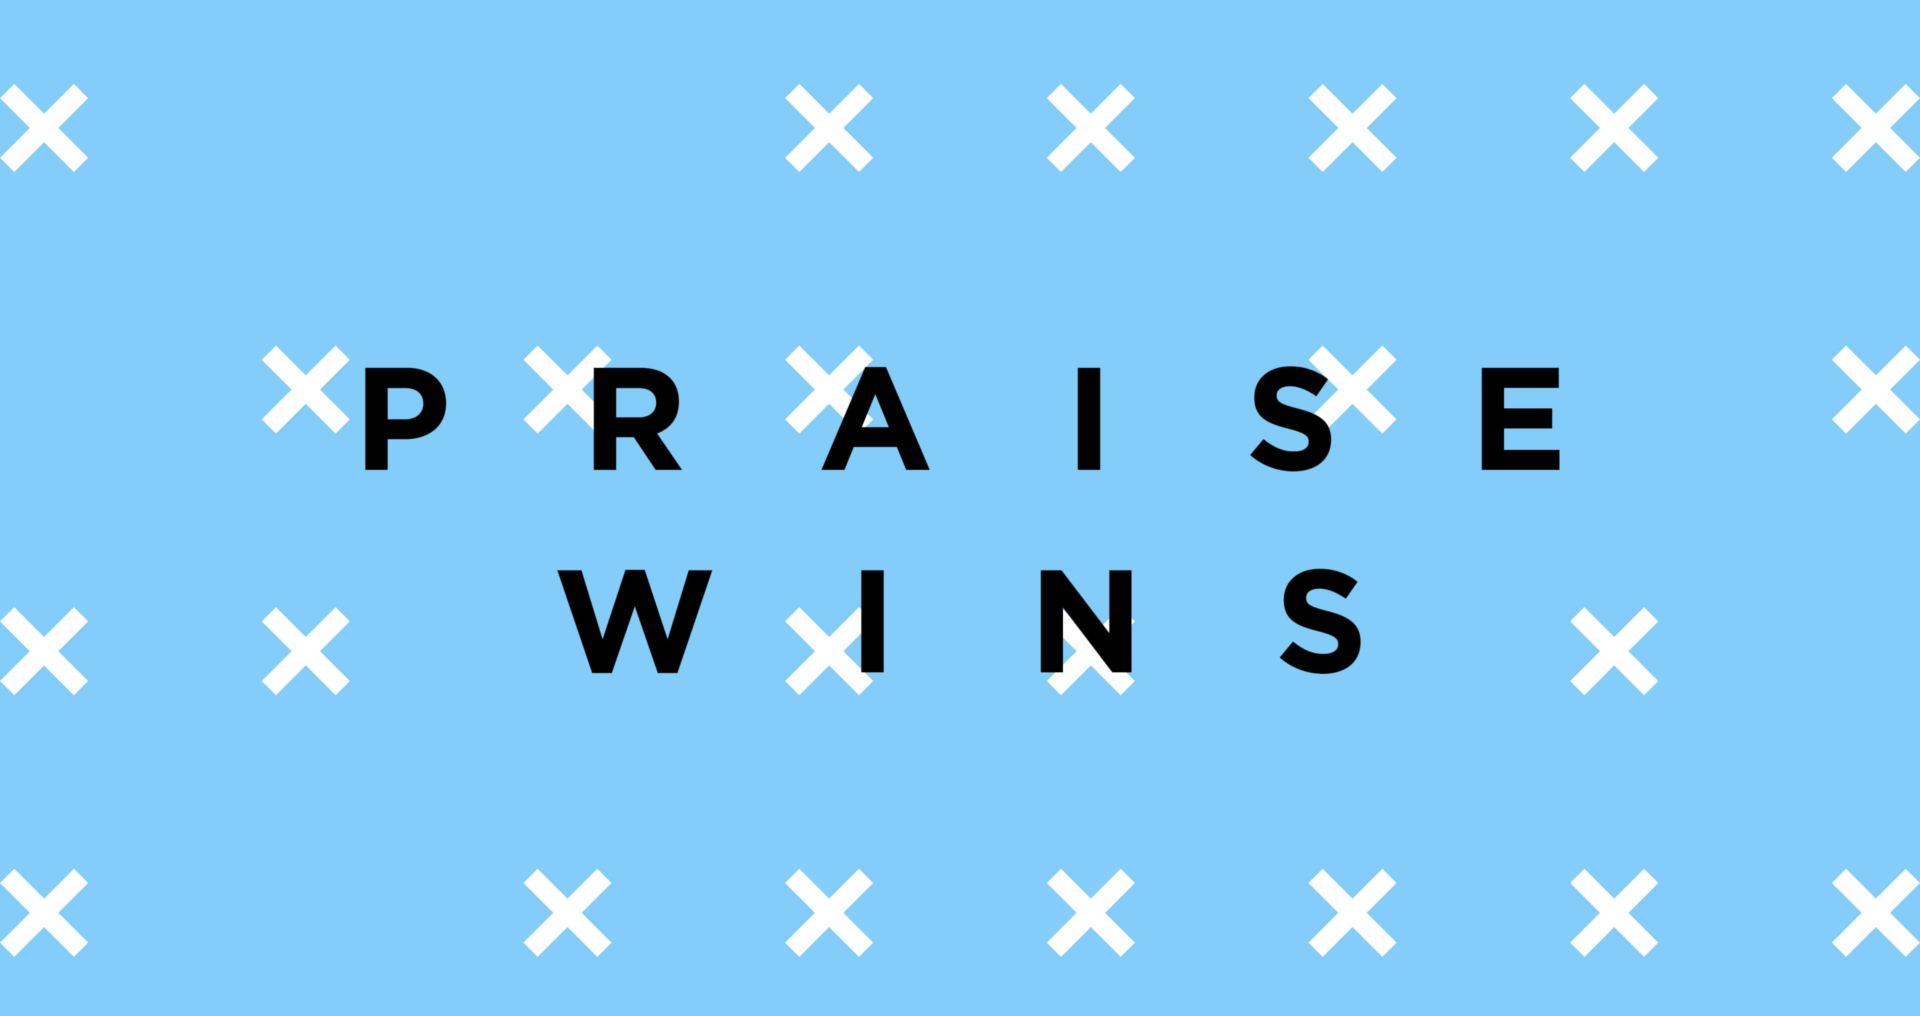 Praise Wins